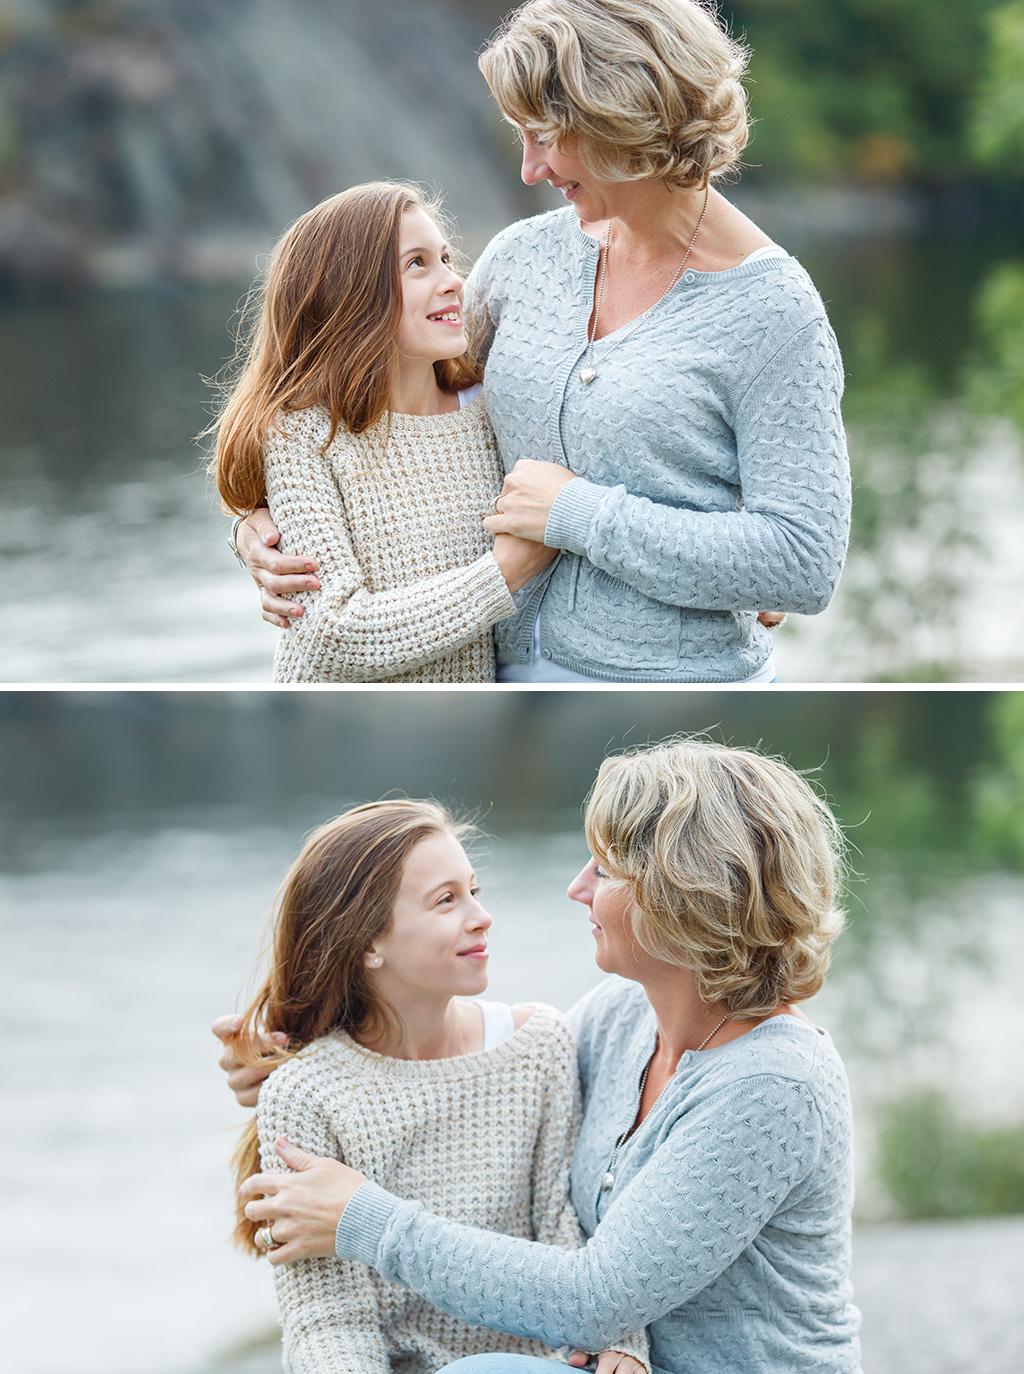 Familjefotografering_i-Stockholm_Lifestyle-familjefotograf-Anna-Sandstrom_10.jpg